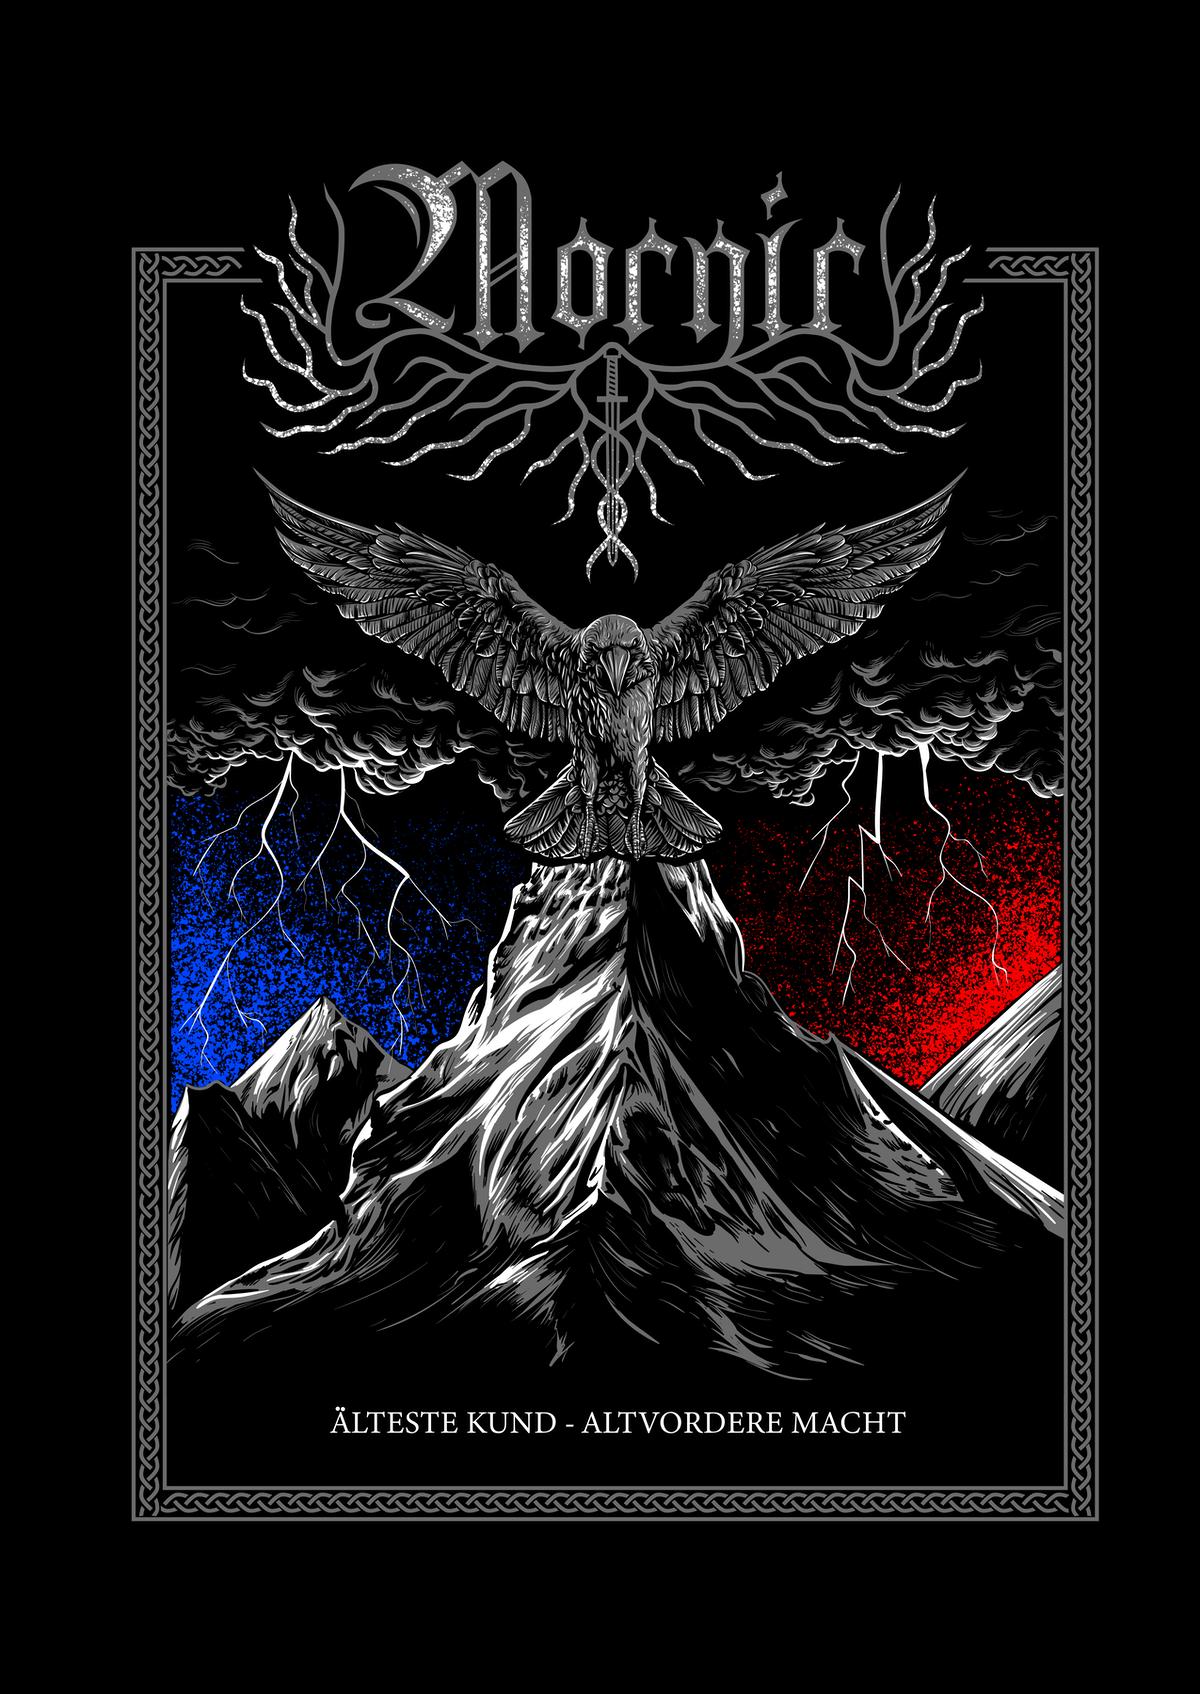 T-Shirt Design for a Pagan Metal Band